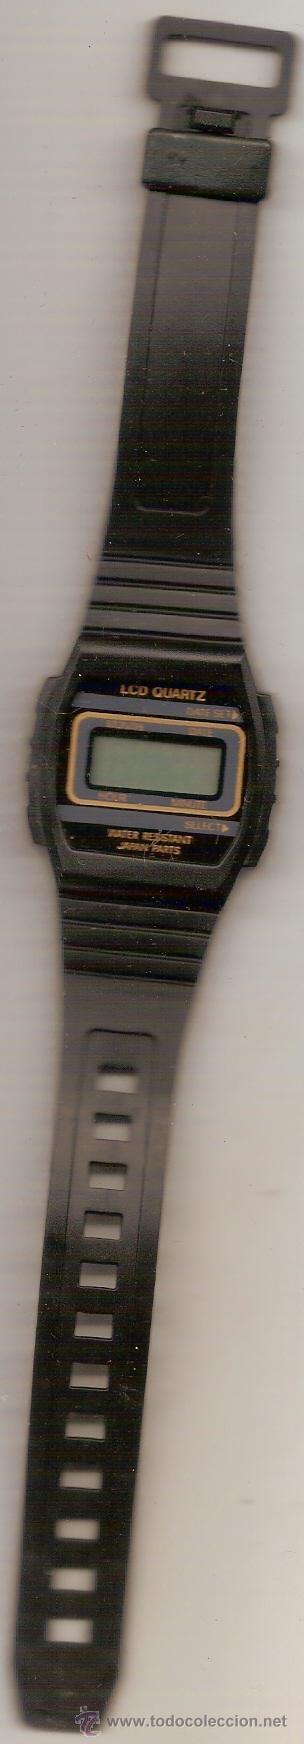 RELOJ DIJITAL SWATH --NUEVO (Relojes - Relojes Actuales - Swatch)